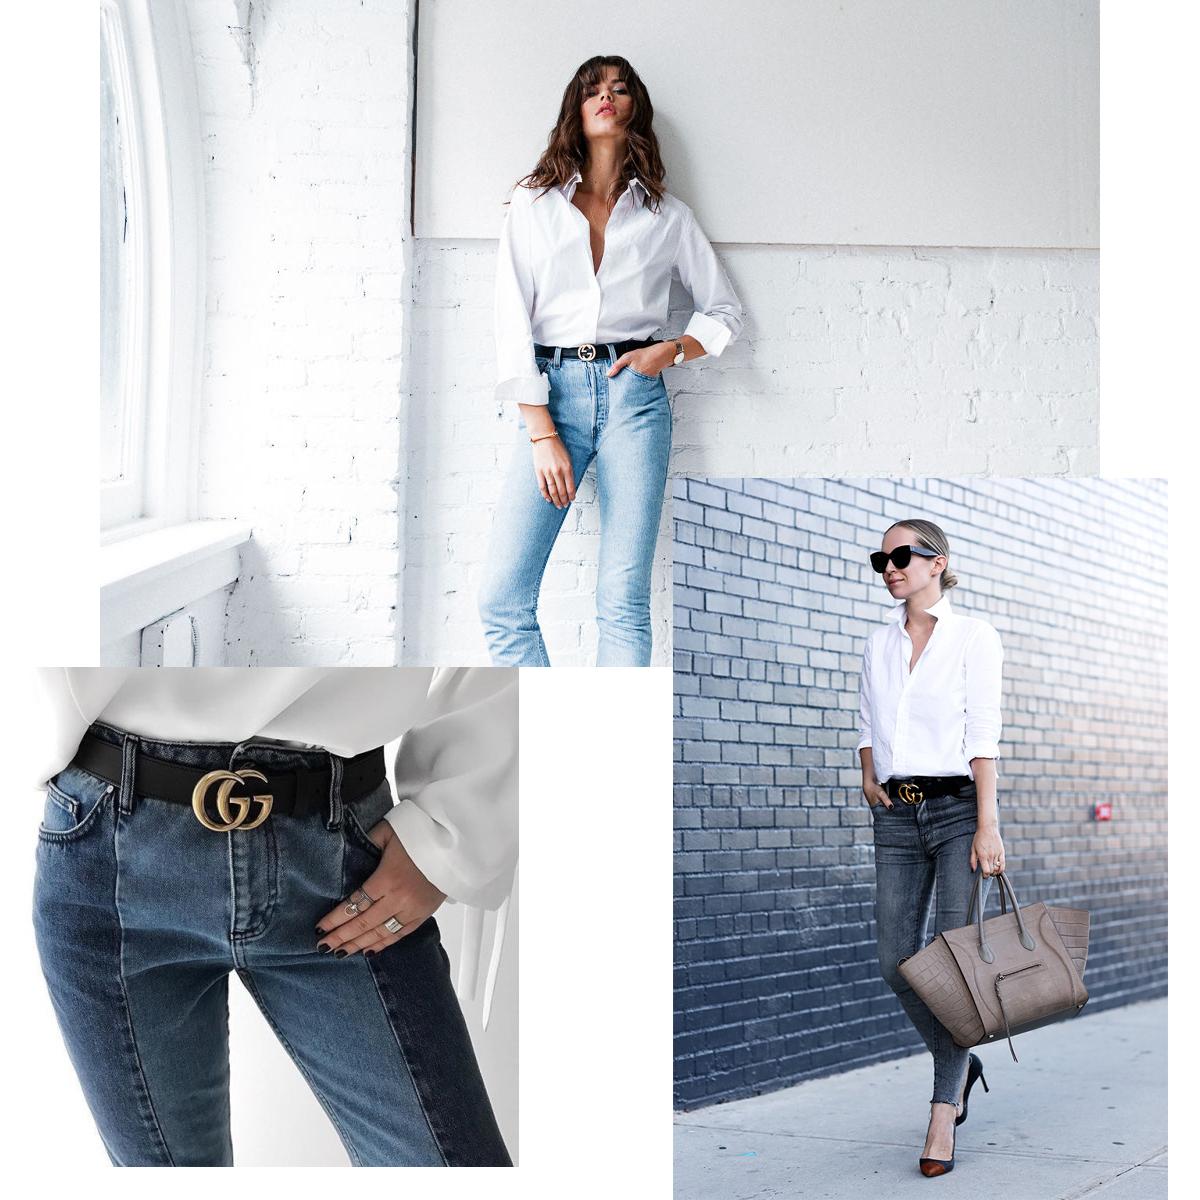 creative-ways-to-wear-a-gucci-belt-italist-magazine-07